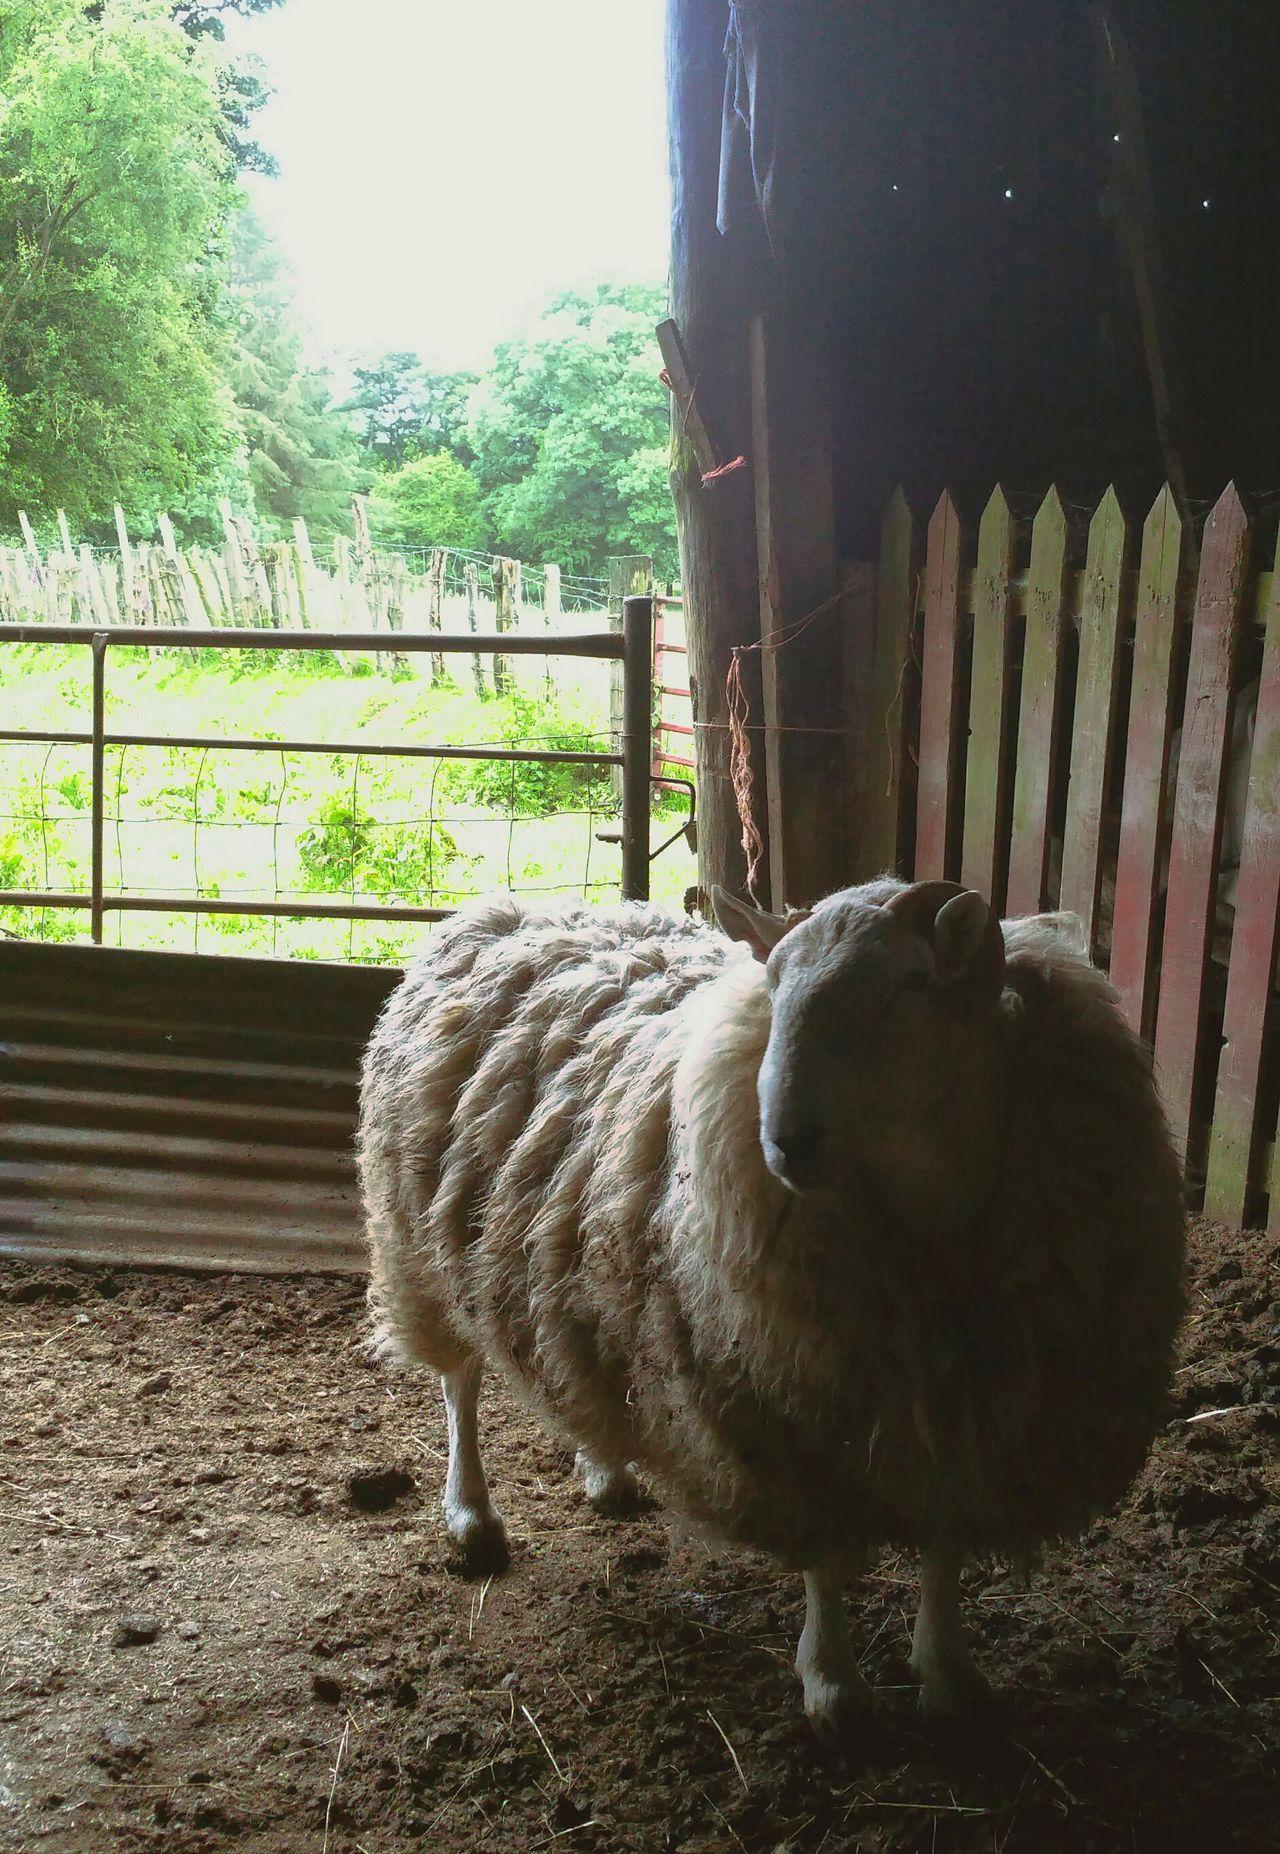 ... a portrait of a RAM ... Sheep Tup Animals Barn Farm Countryside Rural Wales Ovis Aries Ovelhas Ovelles баран